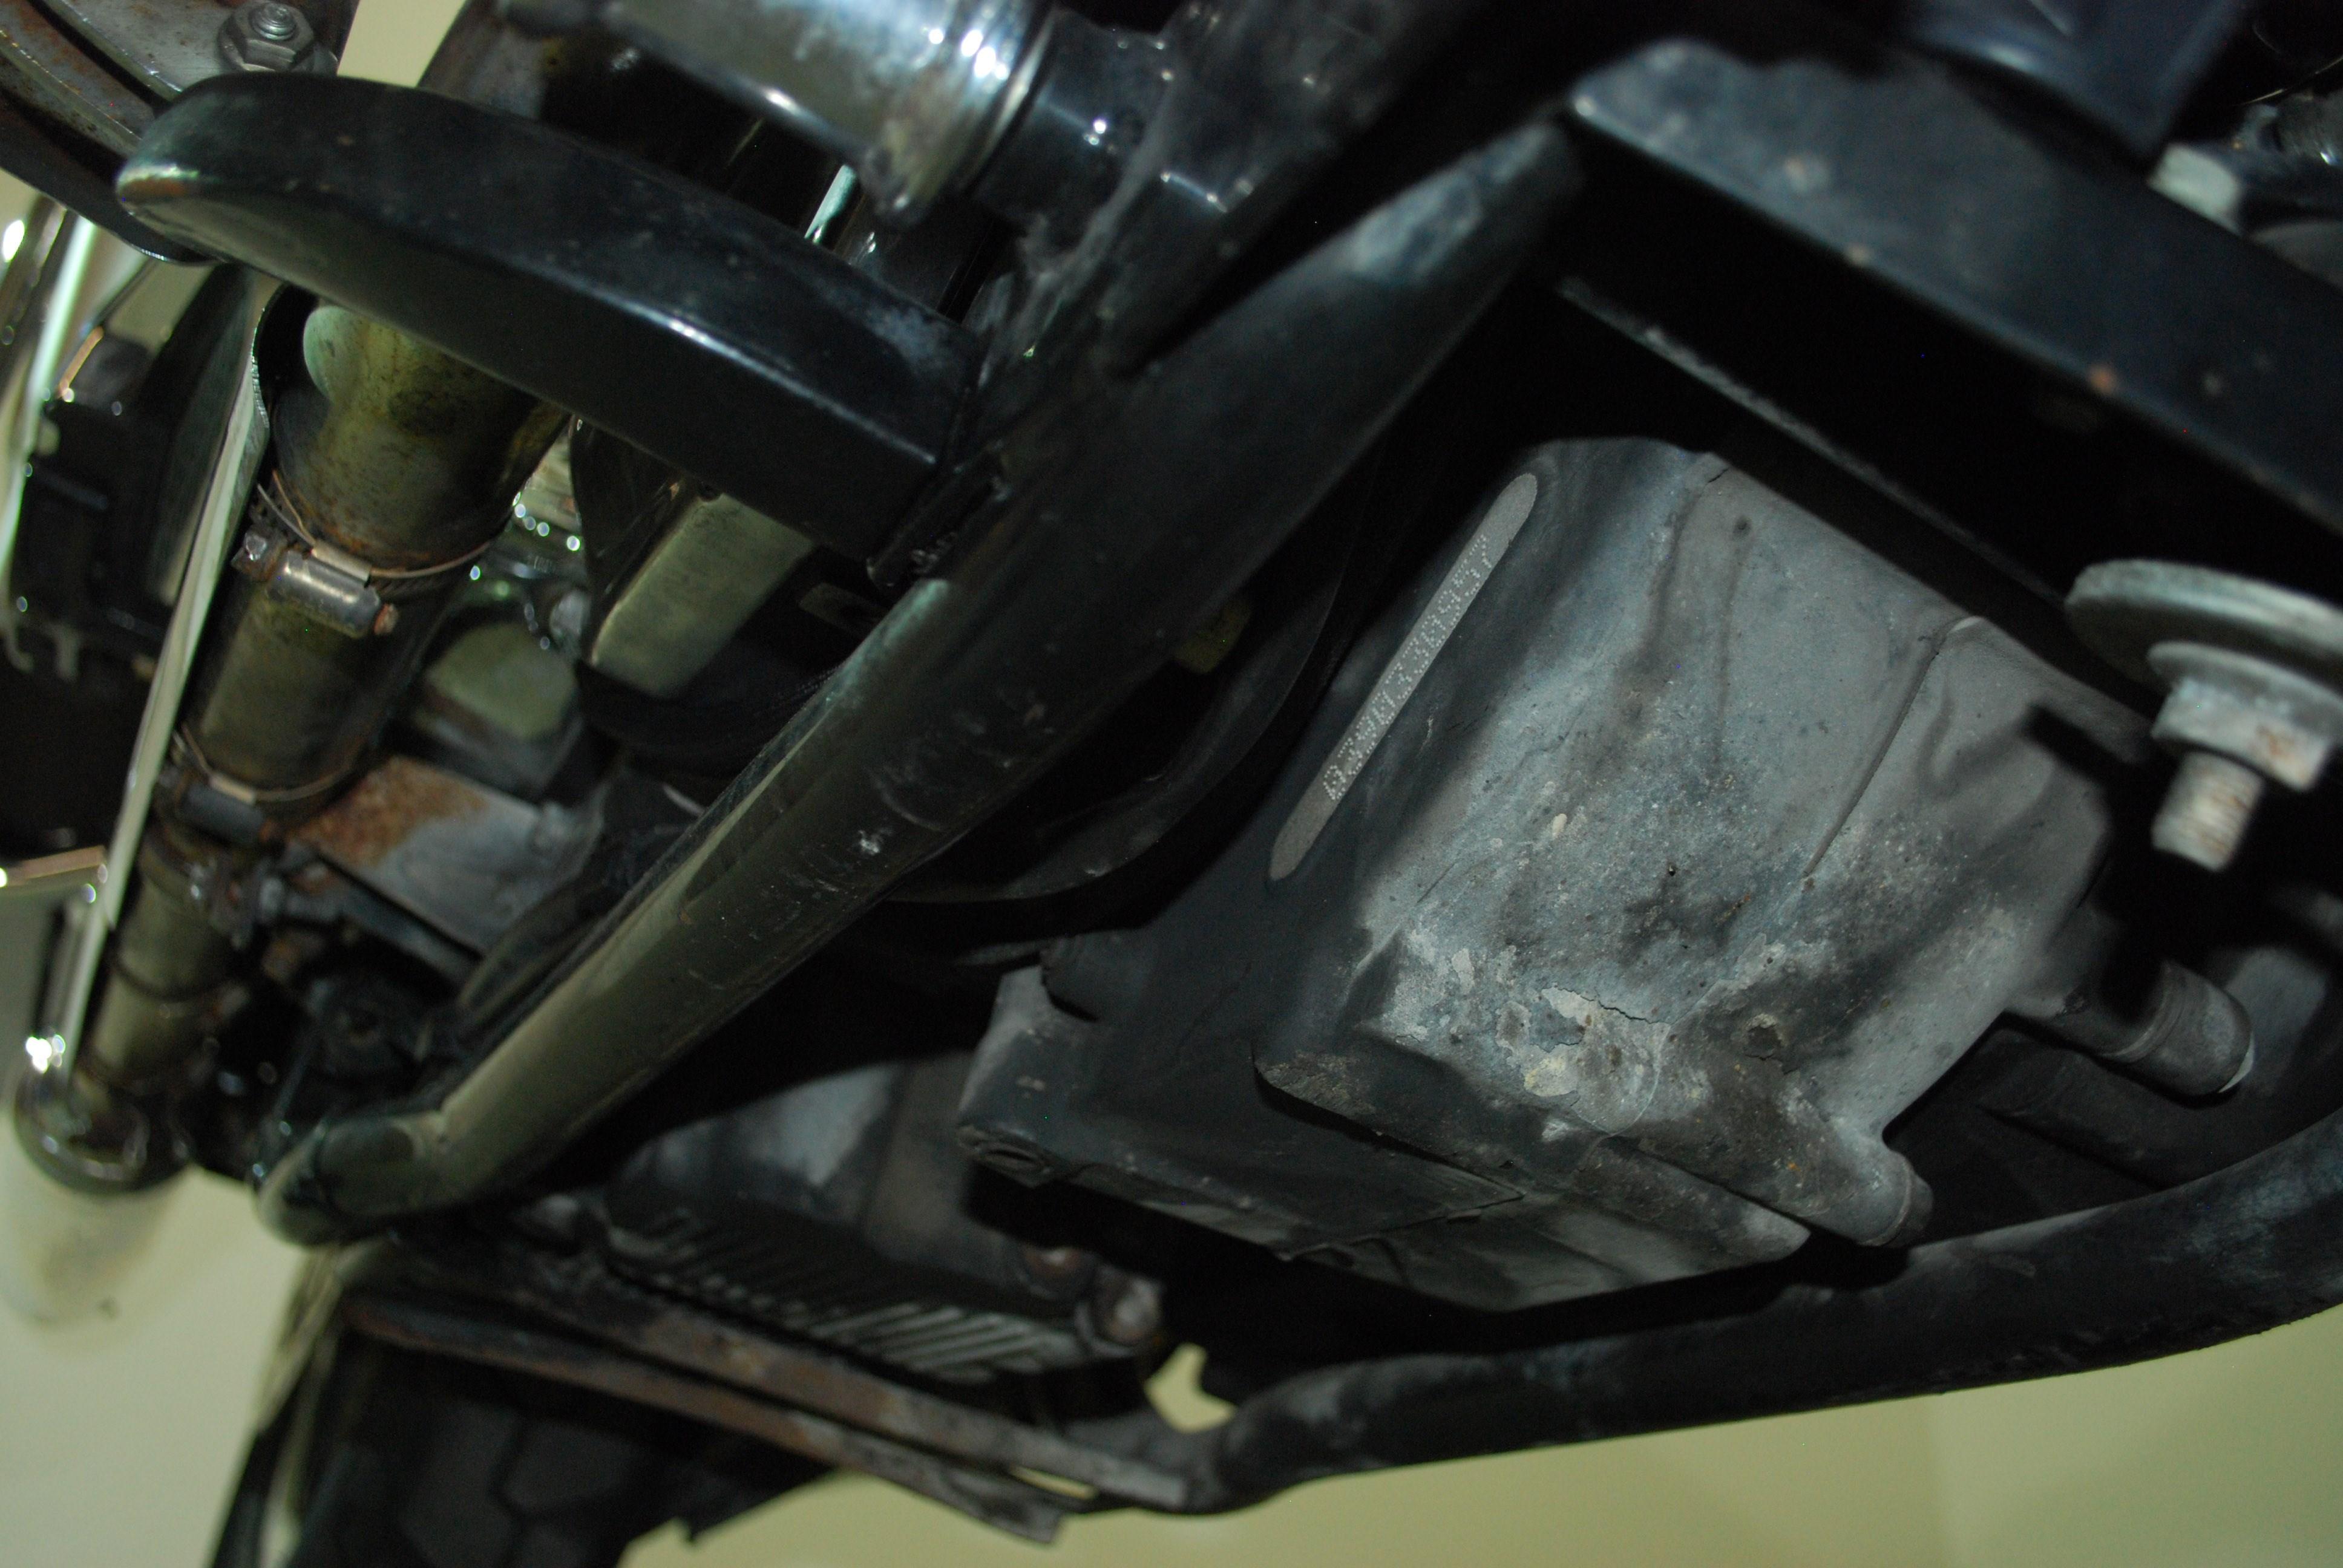 2003 Harley Davidson Fltr I Anv Road Glide Anniversary Sterling Horn Wiring Diagram Silver And Vivid Black Warren Michigan 678221 Chopperexchange